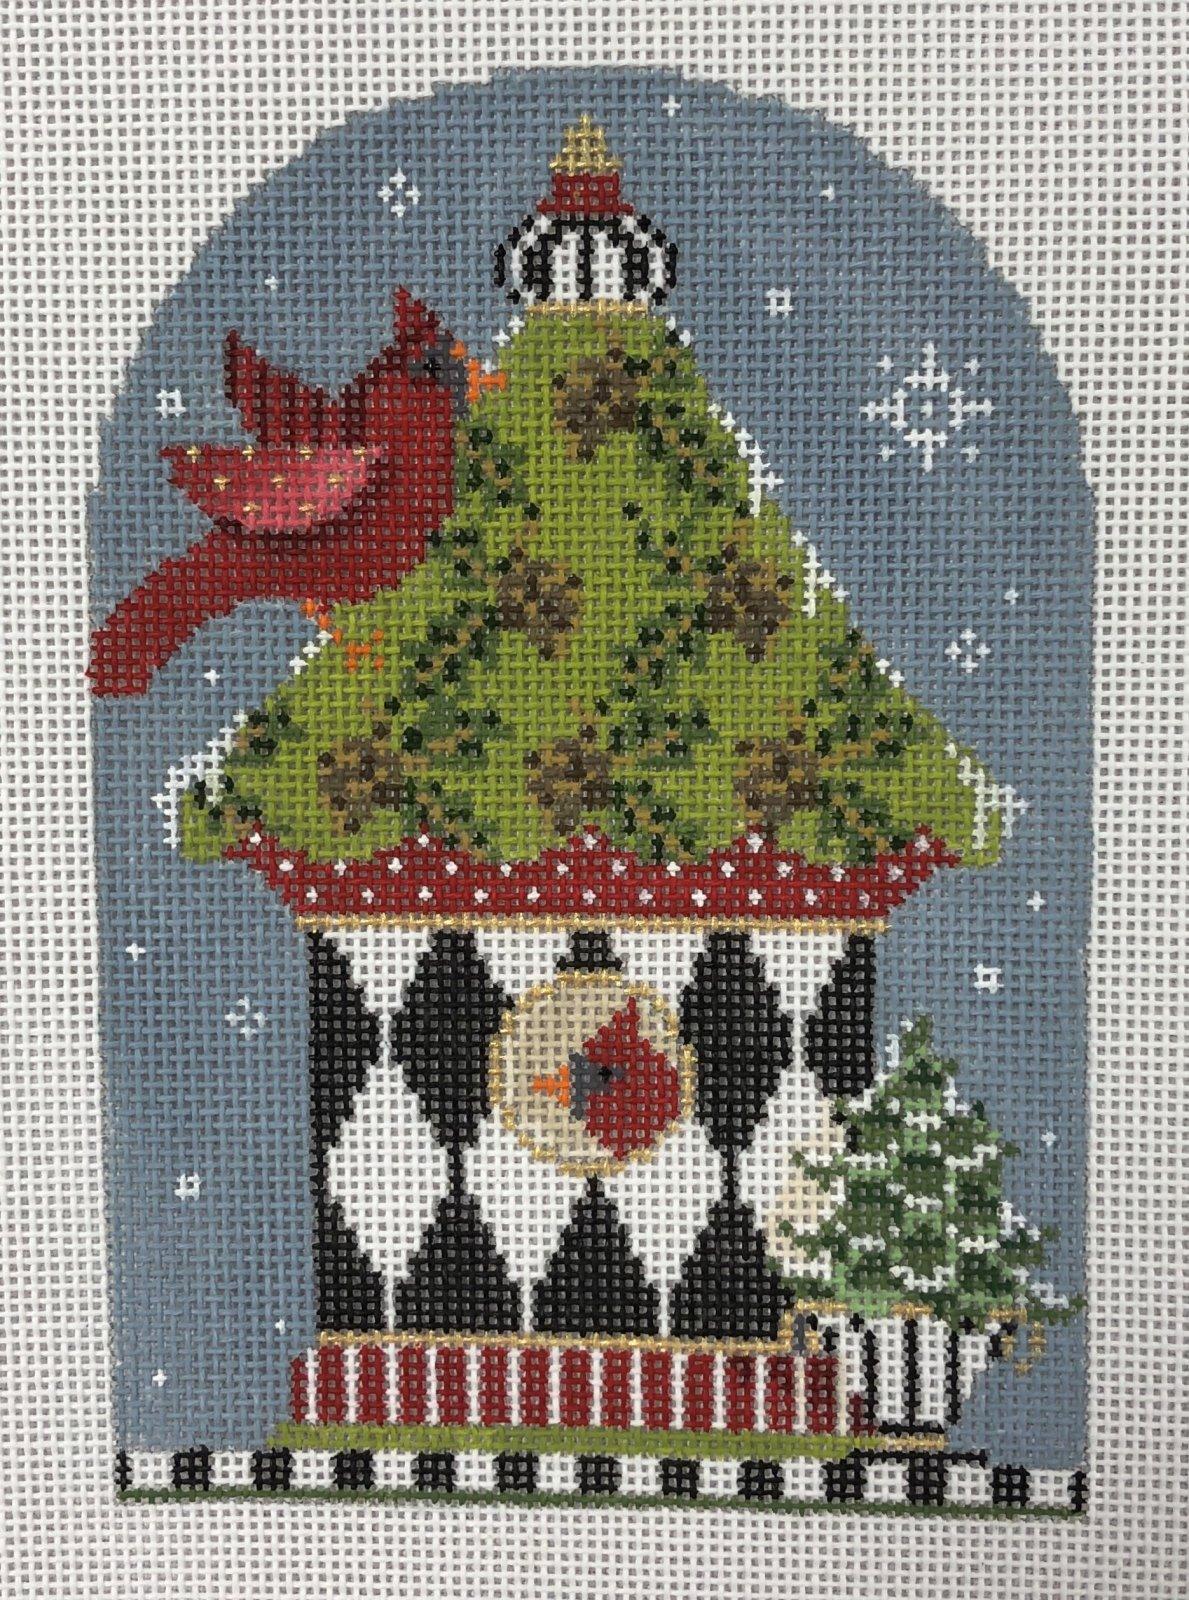 birdhouse, winter 10